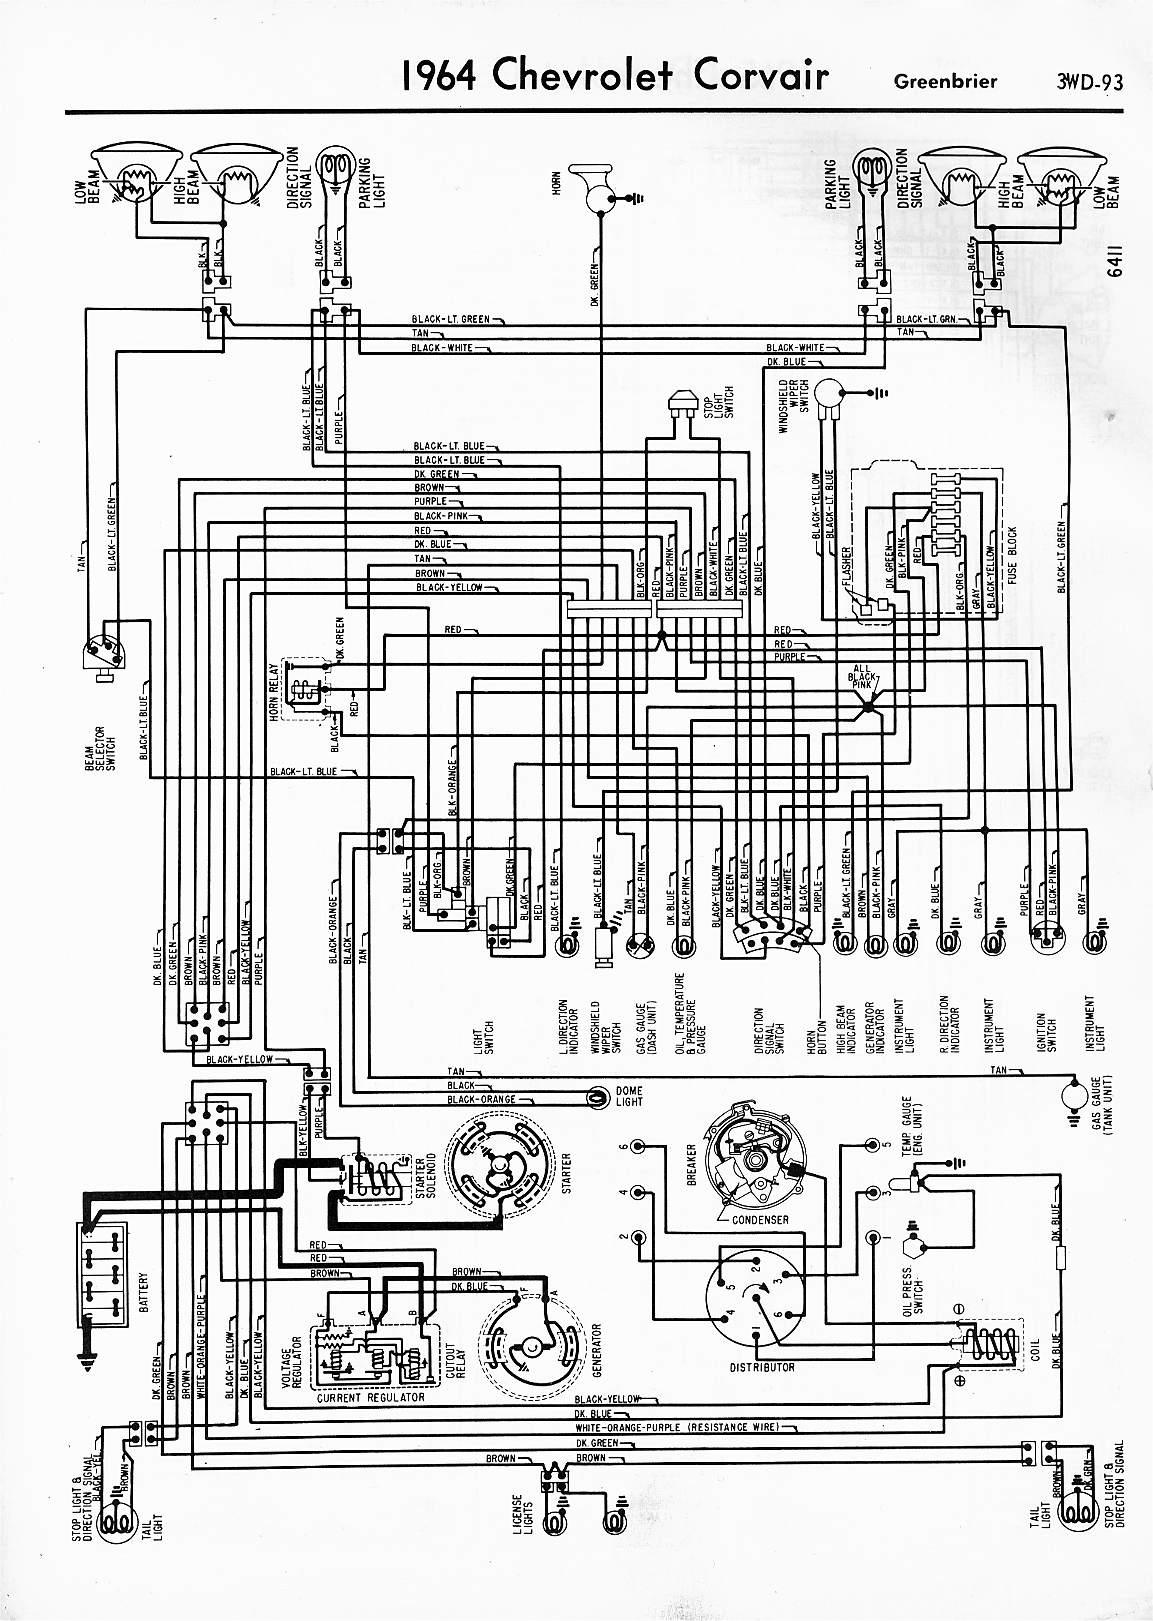 Free Wiring Diagram Corvair Pontiac 2004 Ford E 450 Fuse Diagram Model For Wiring Diagram Schematics